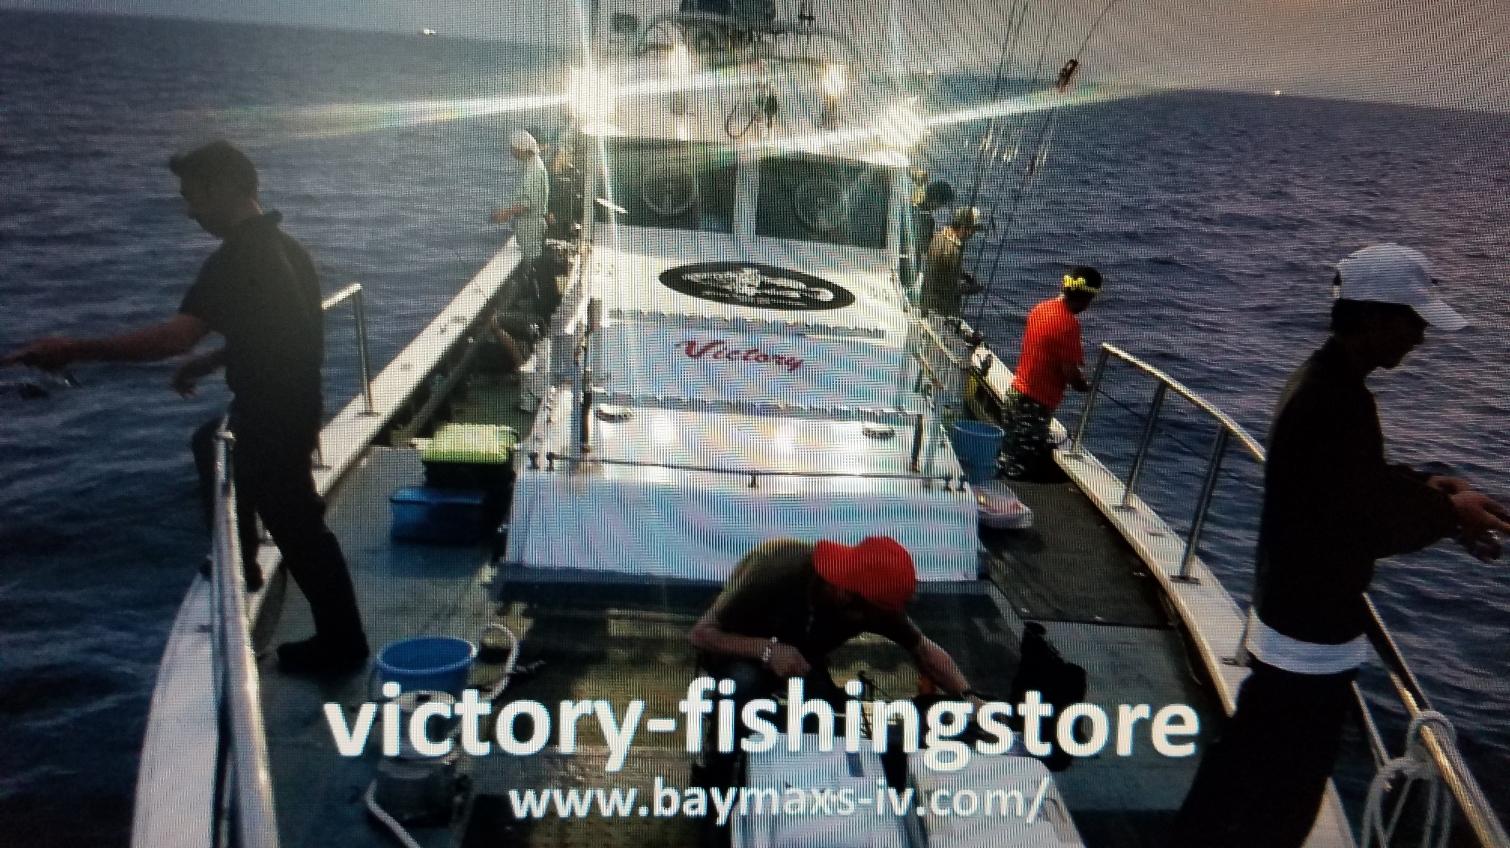 VICTORYオリジナルルアー釣り市場